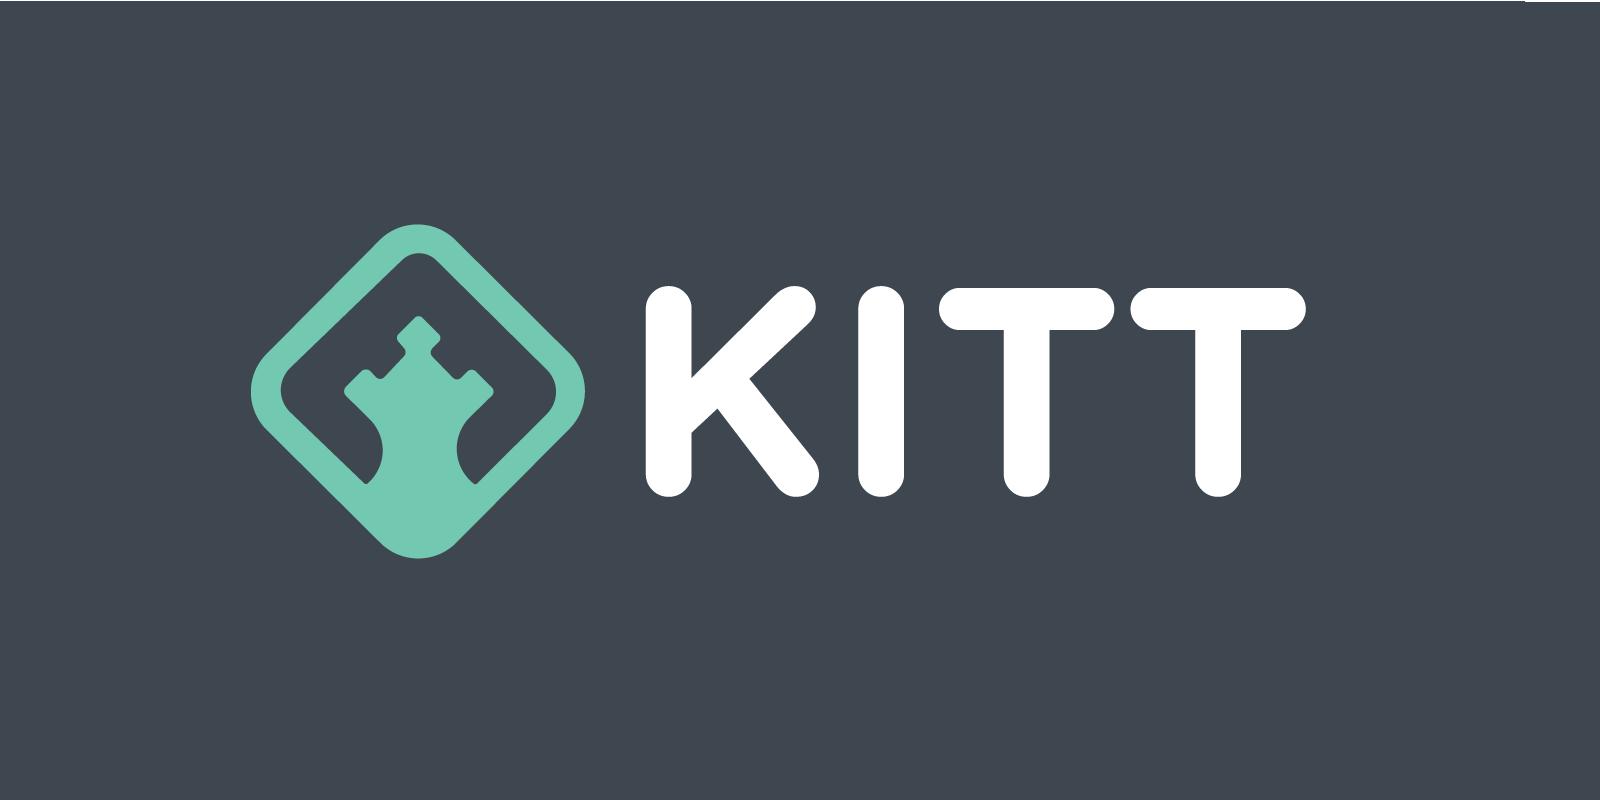 kittyArtboard 1@2x.png